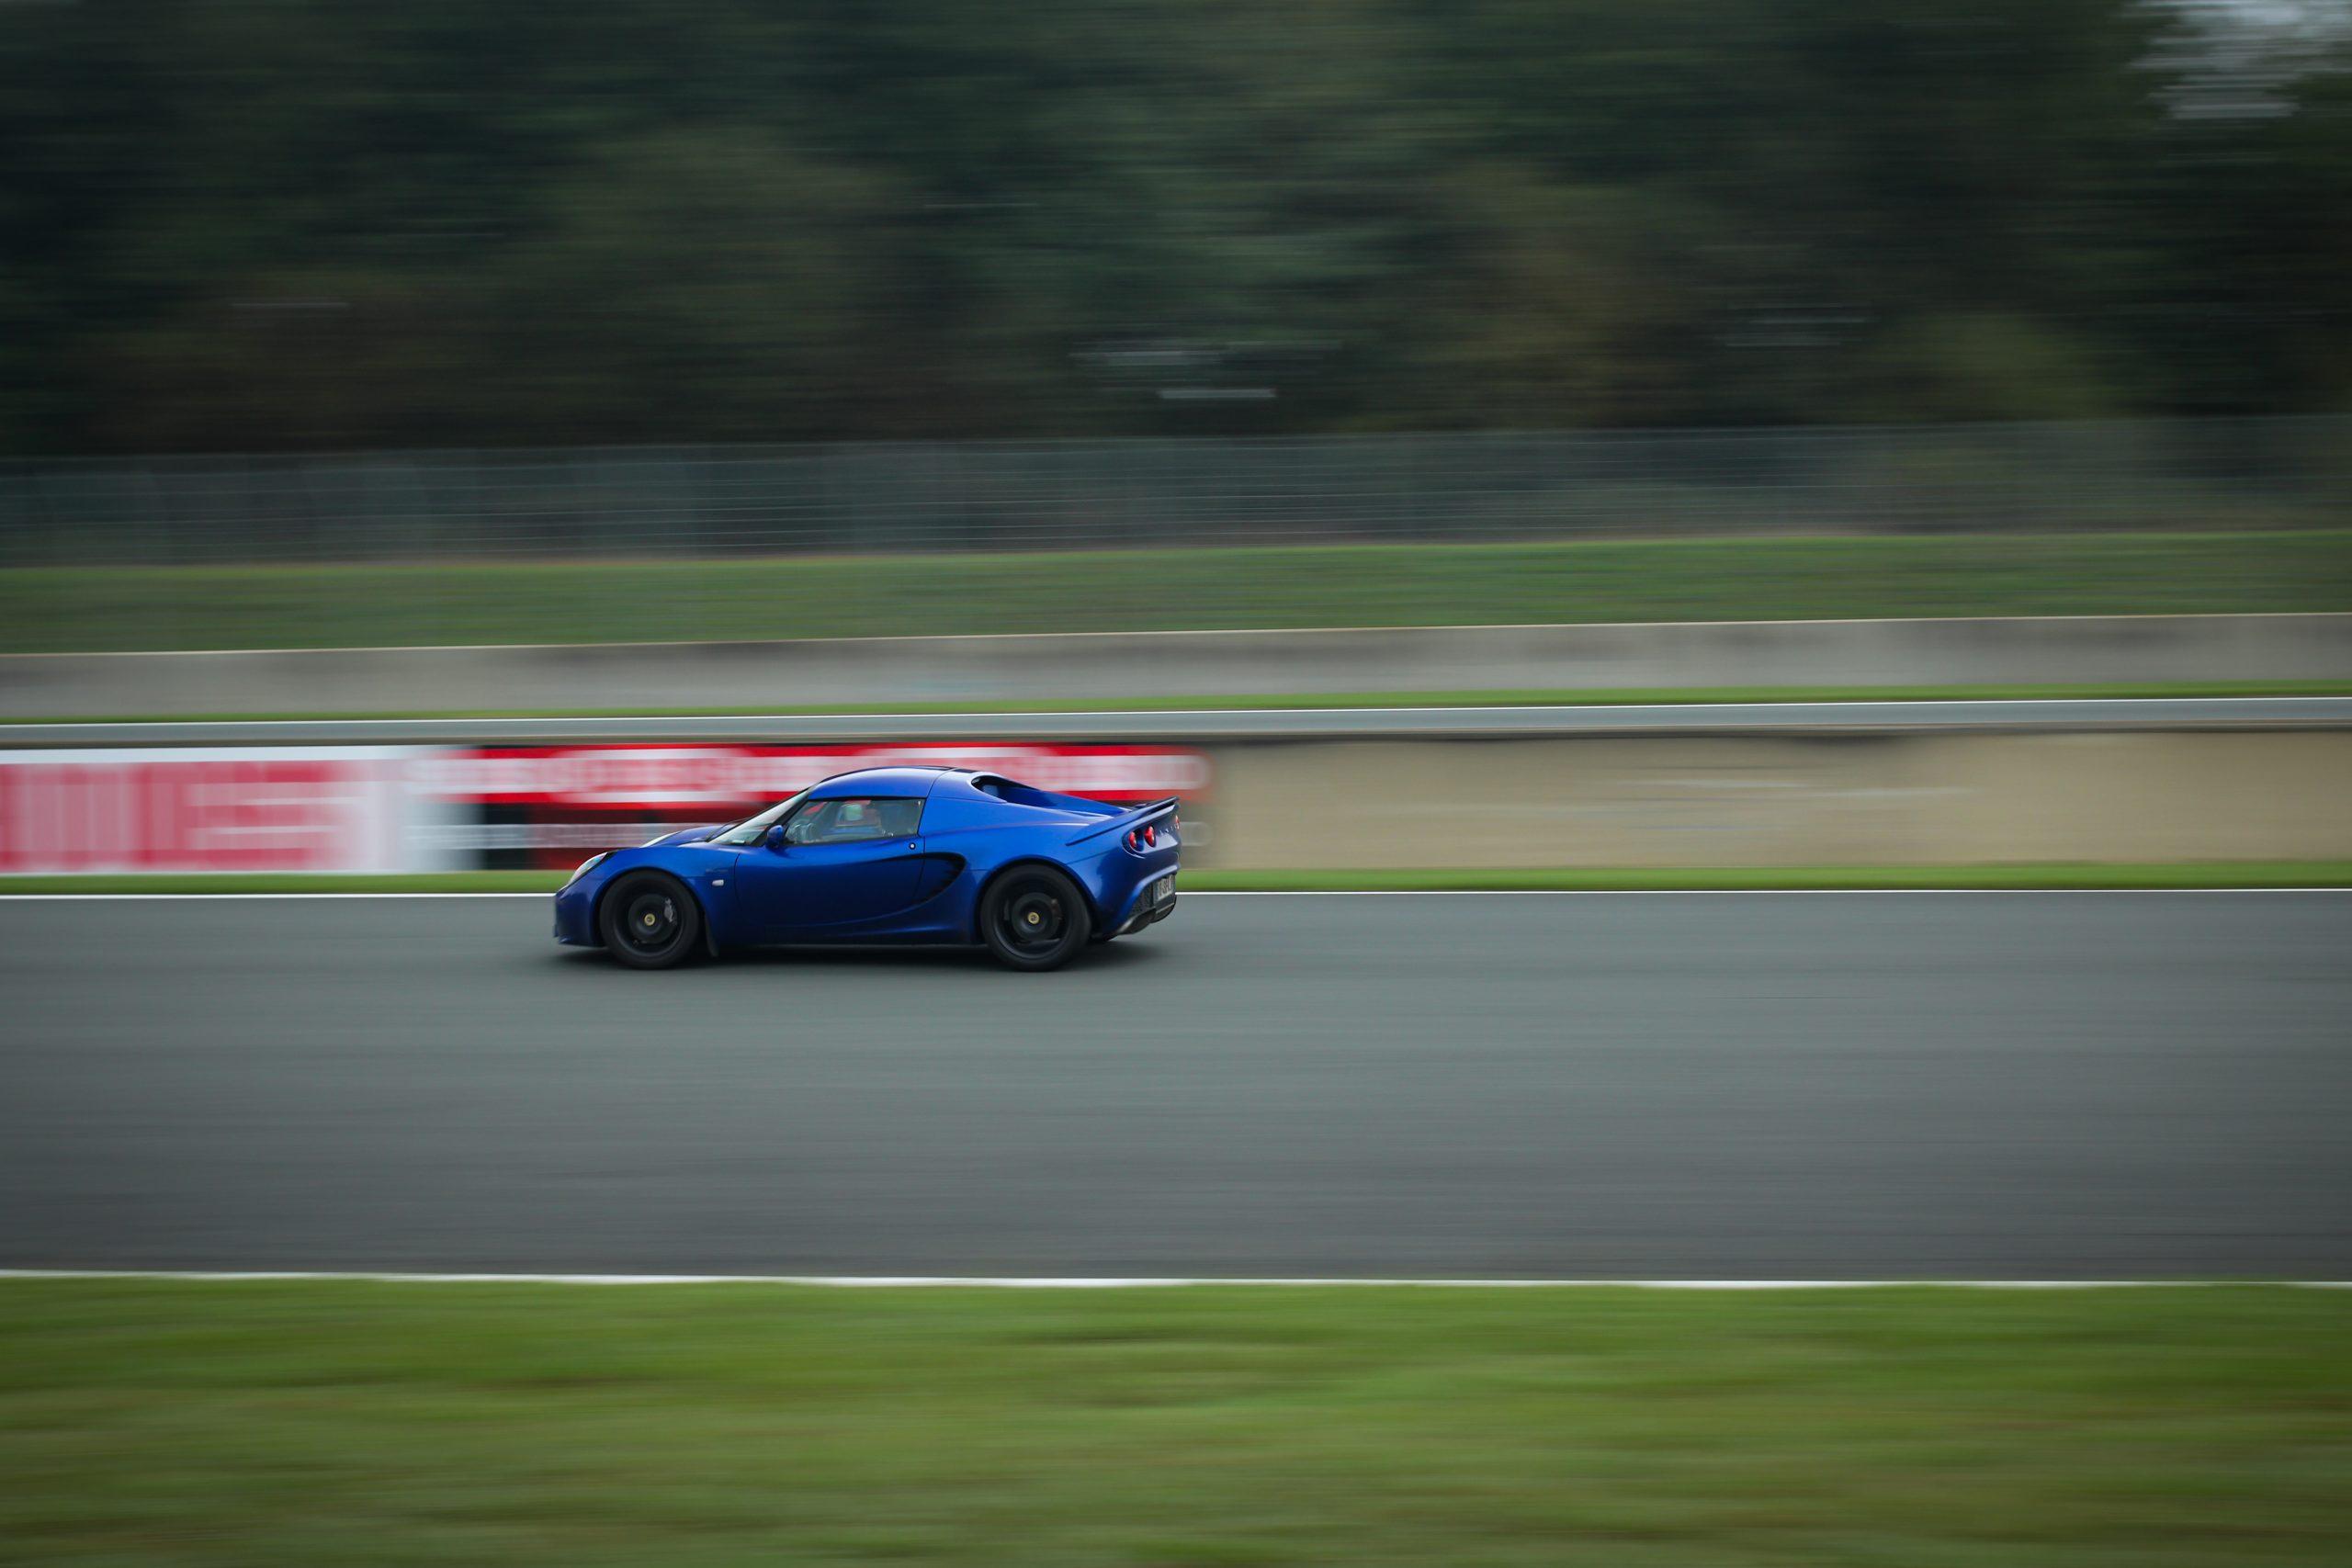 Lotus Elise bleue